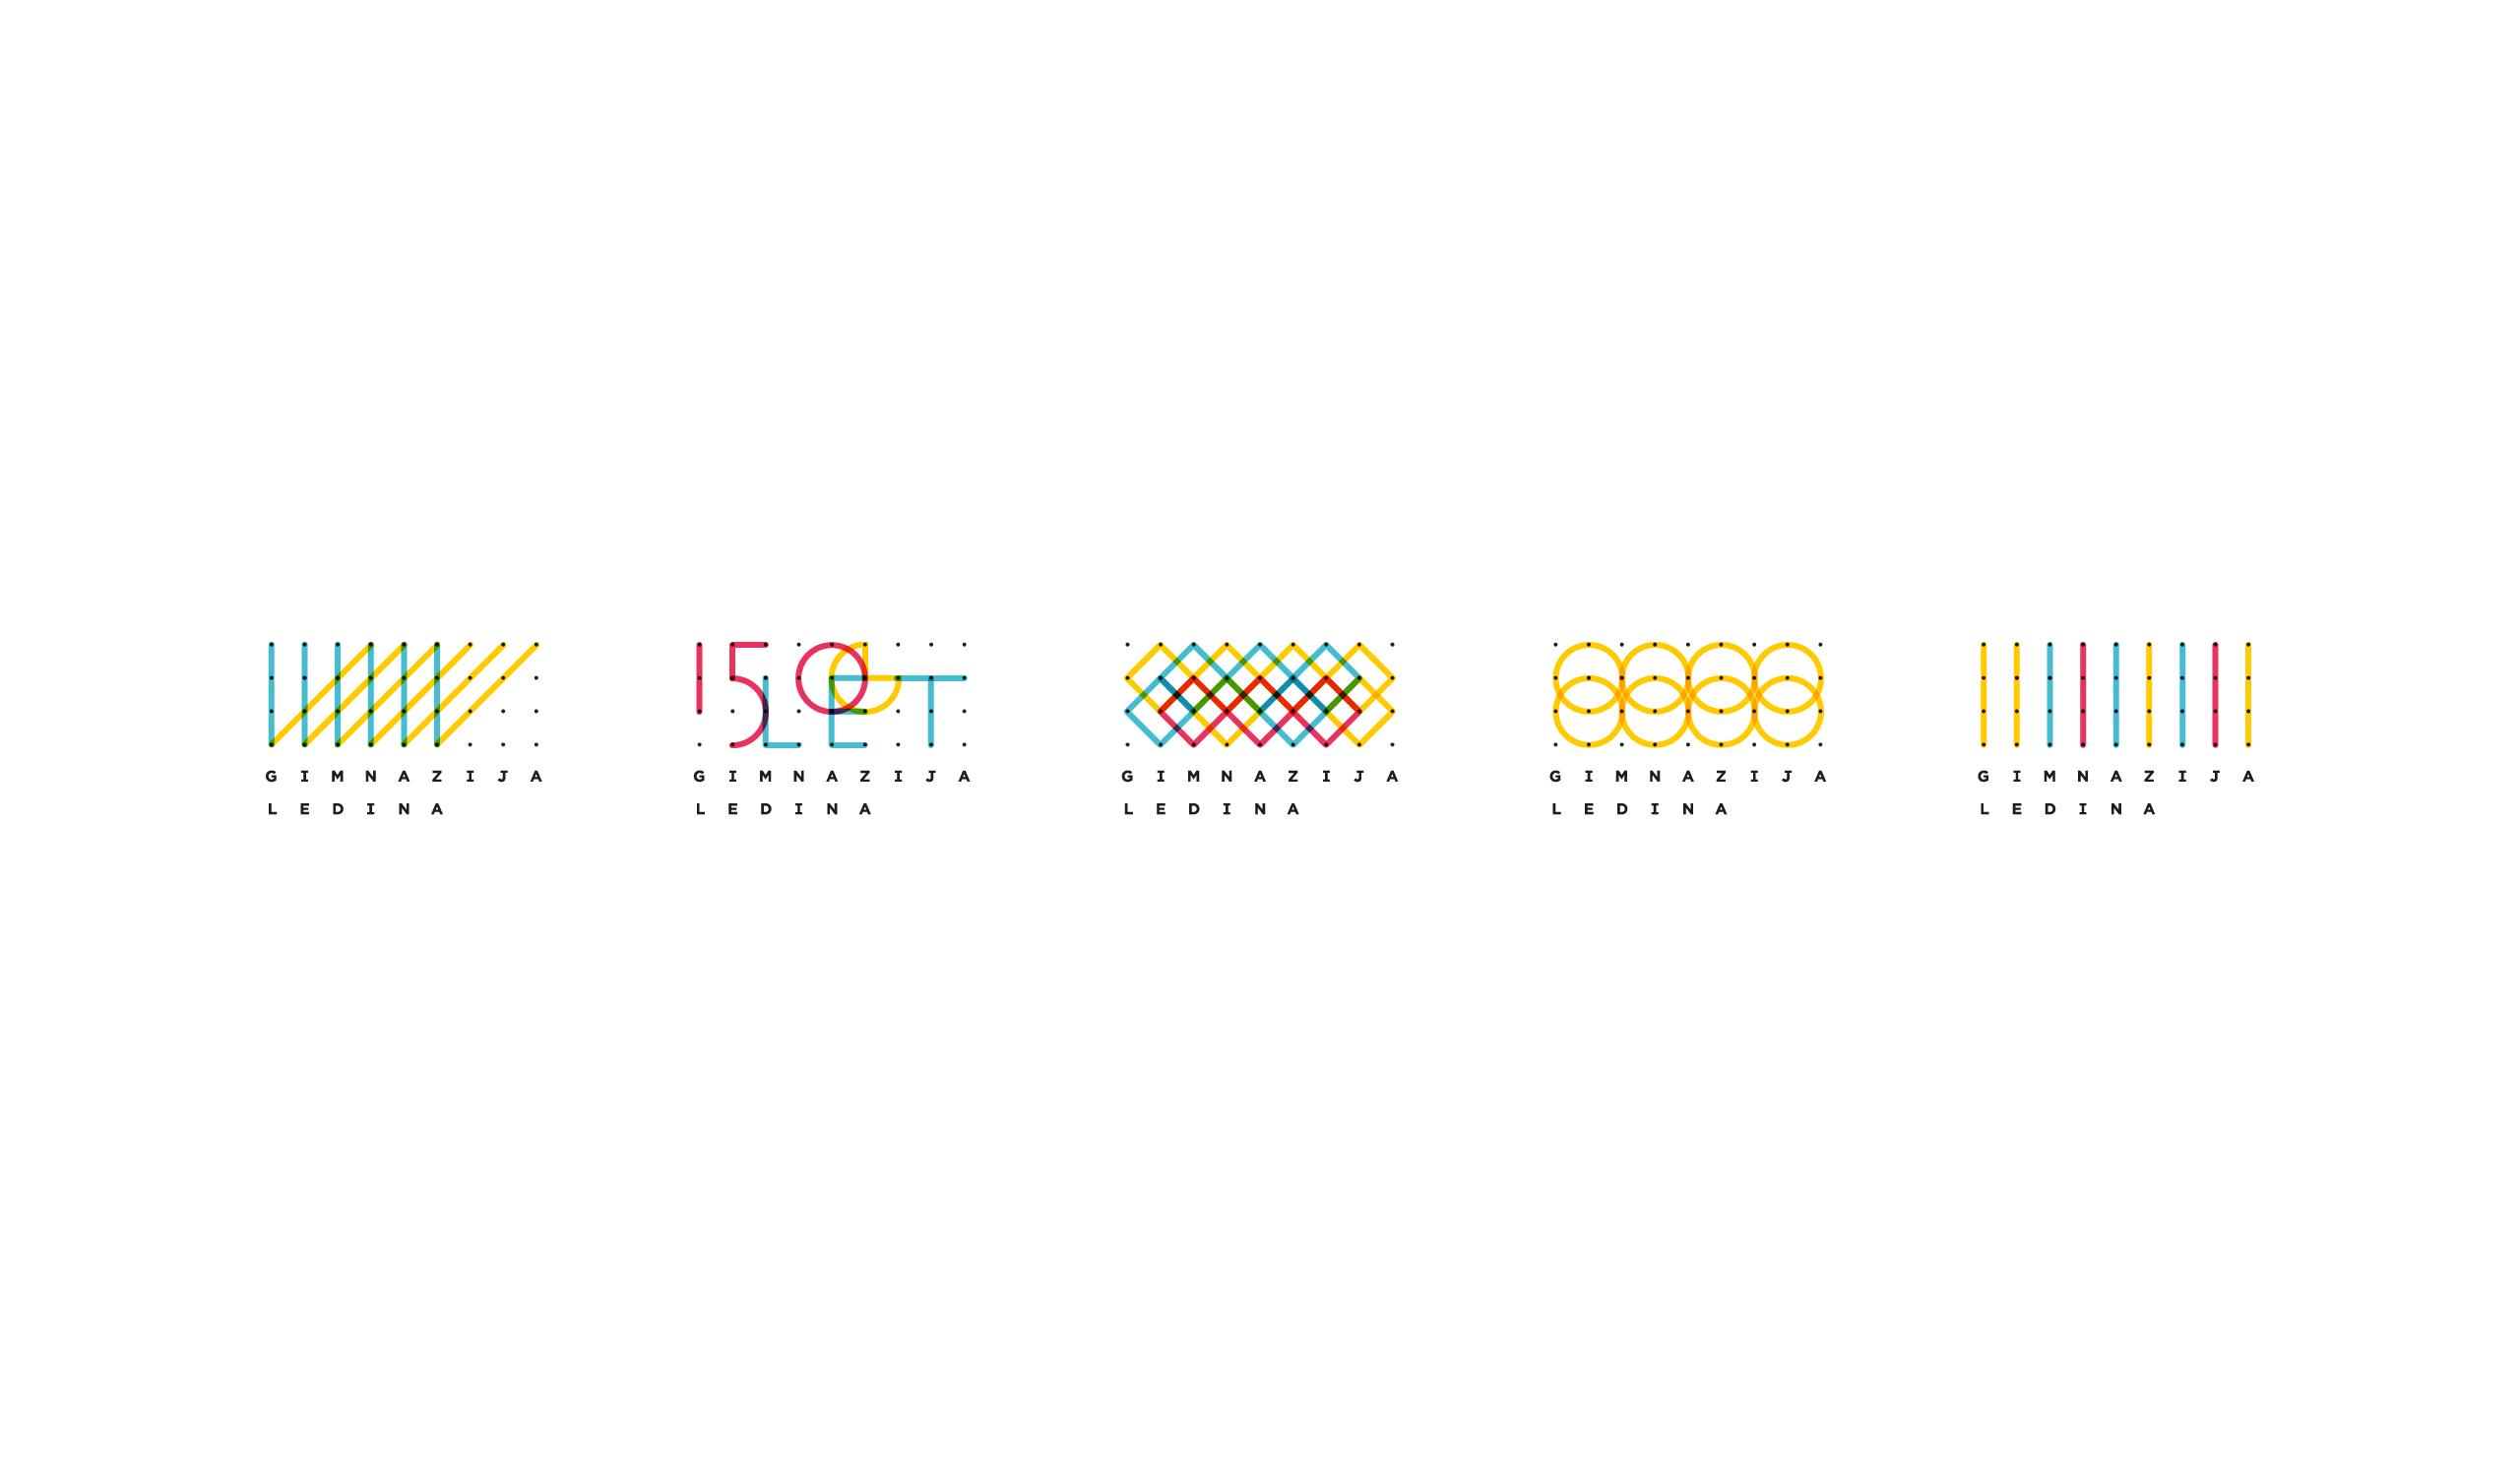 ledina-logo–02